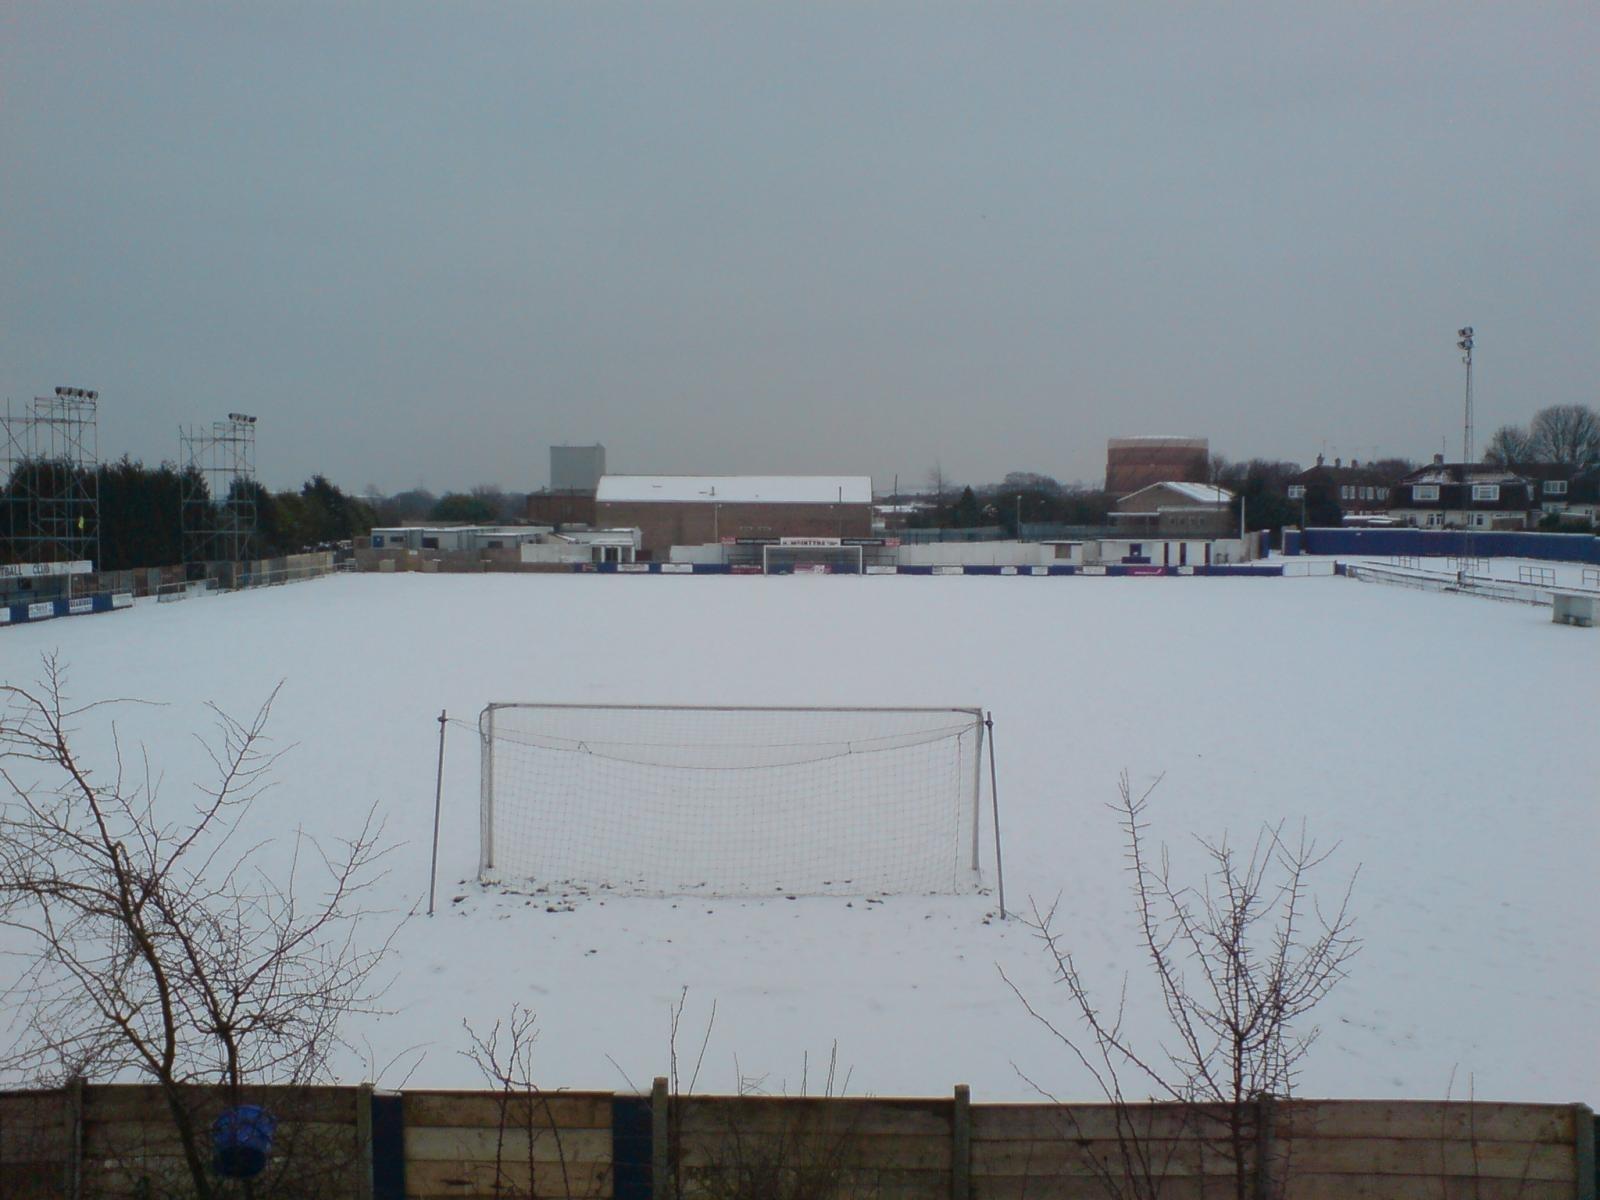 Creasey Park from Chav Hill